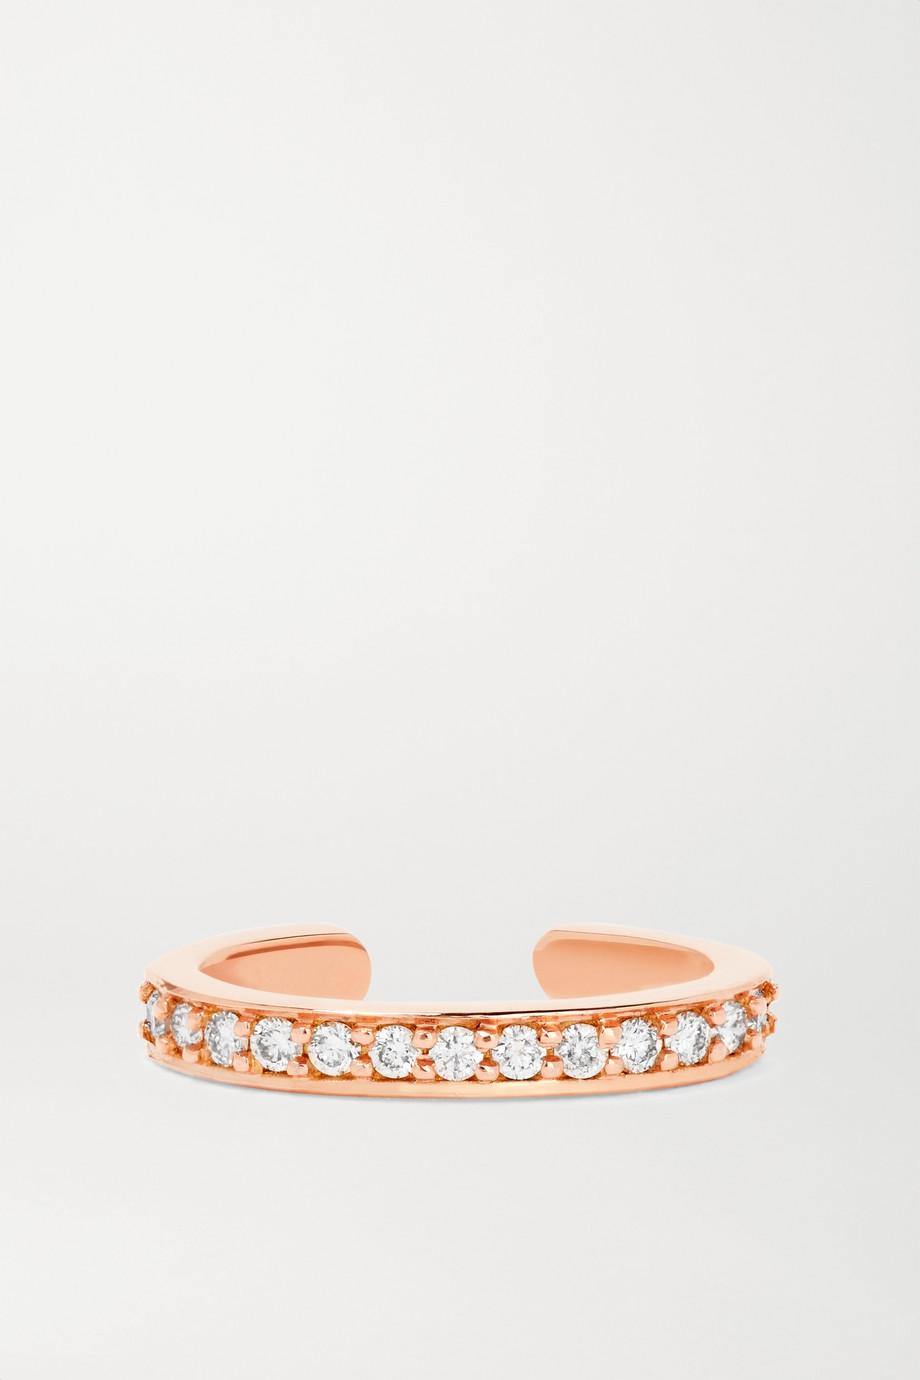 Anita Ko Bijou d'oreille en or rose 18carats (750/1000) et diamants